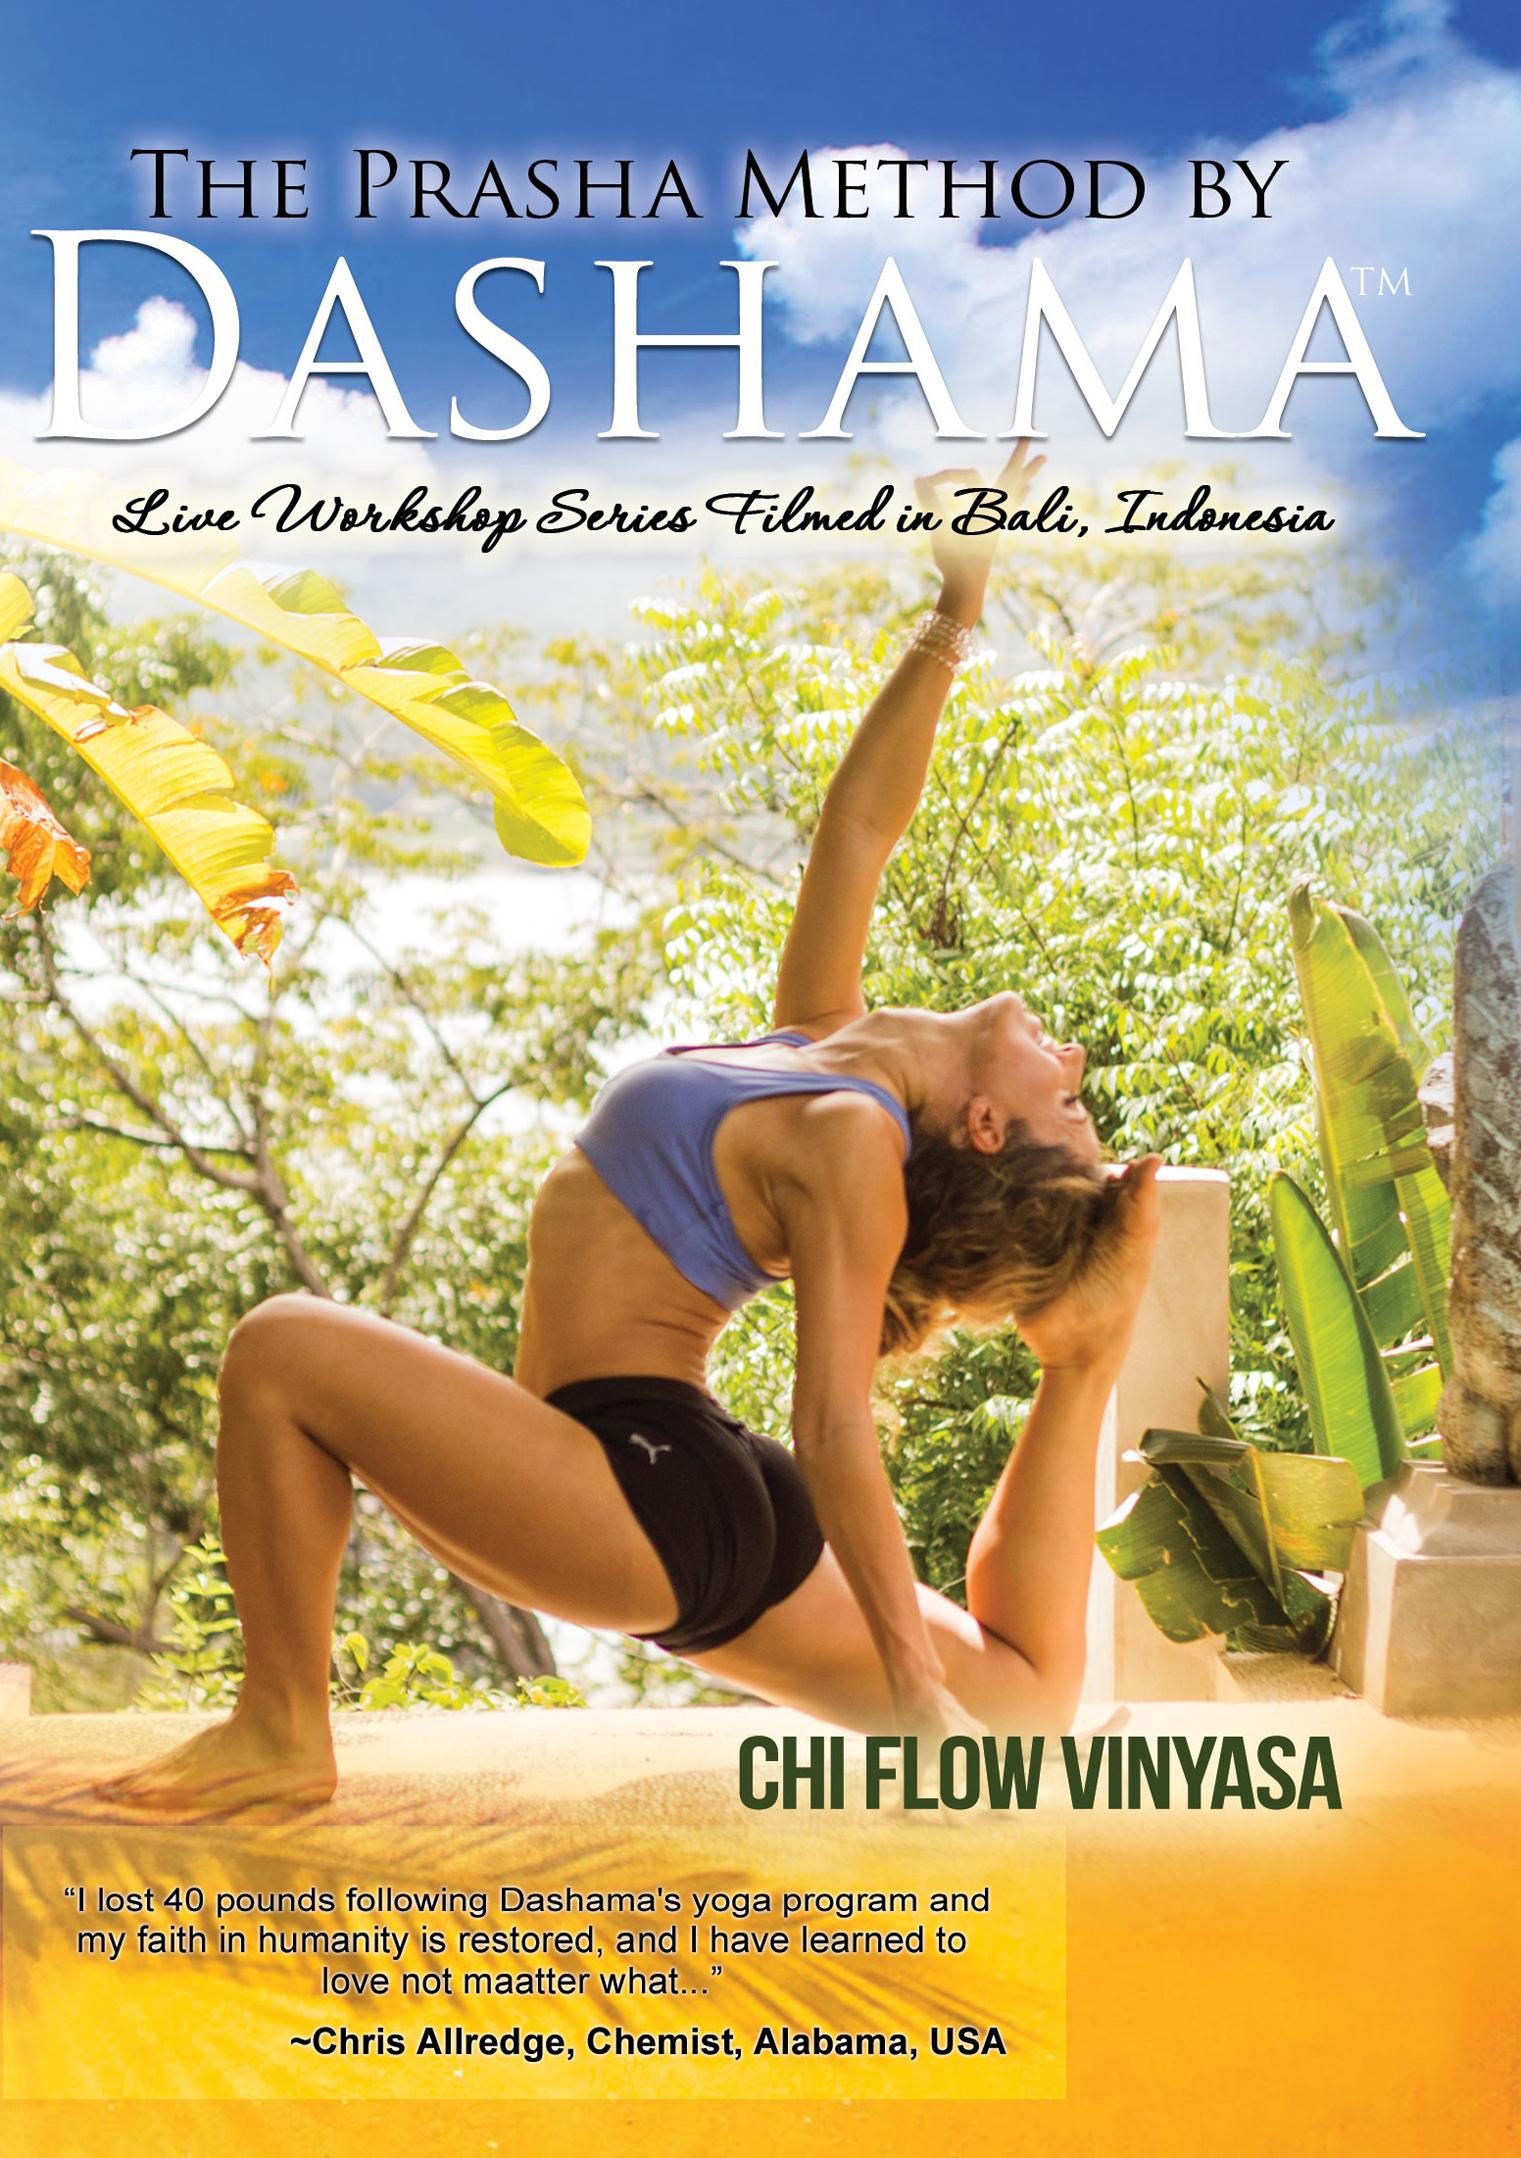 The Prasha Method by Dashama: Chi Flow Vinyasa